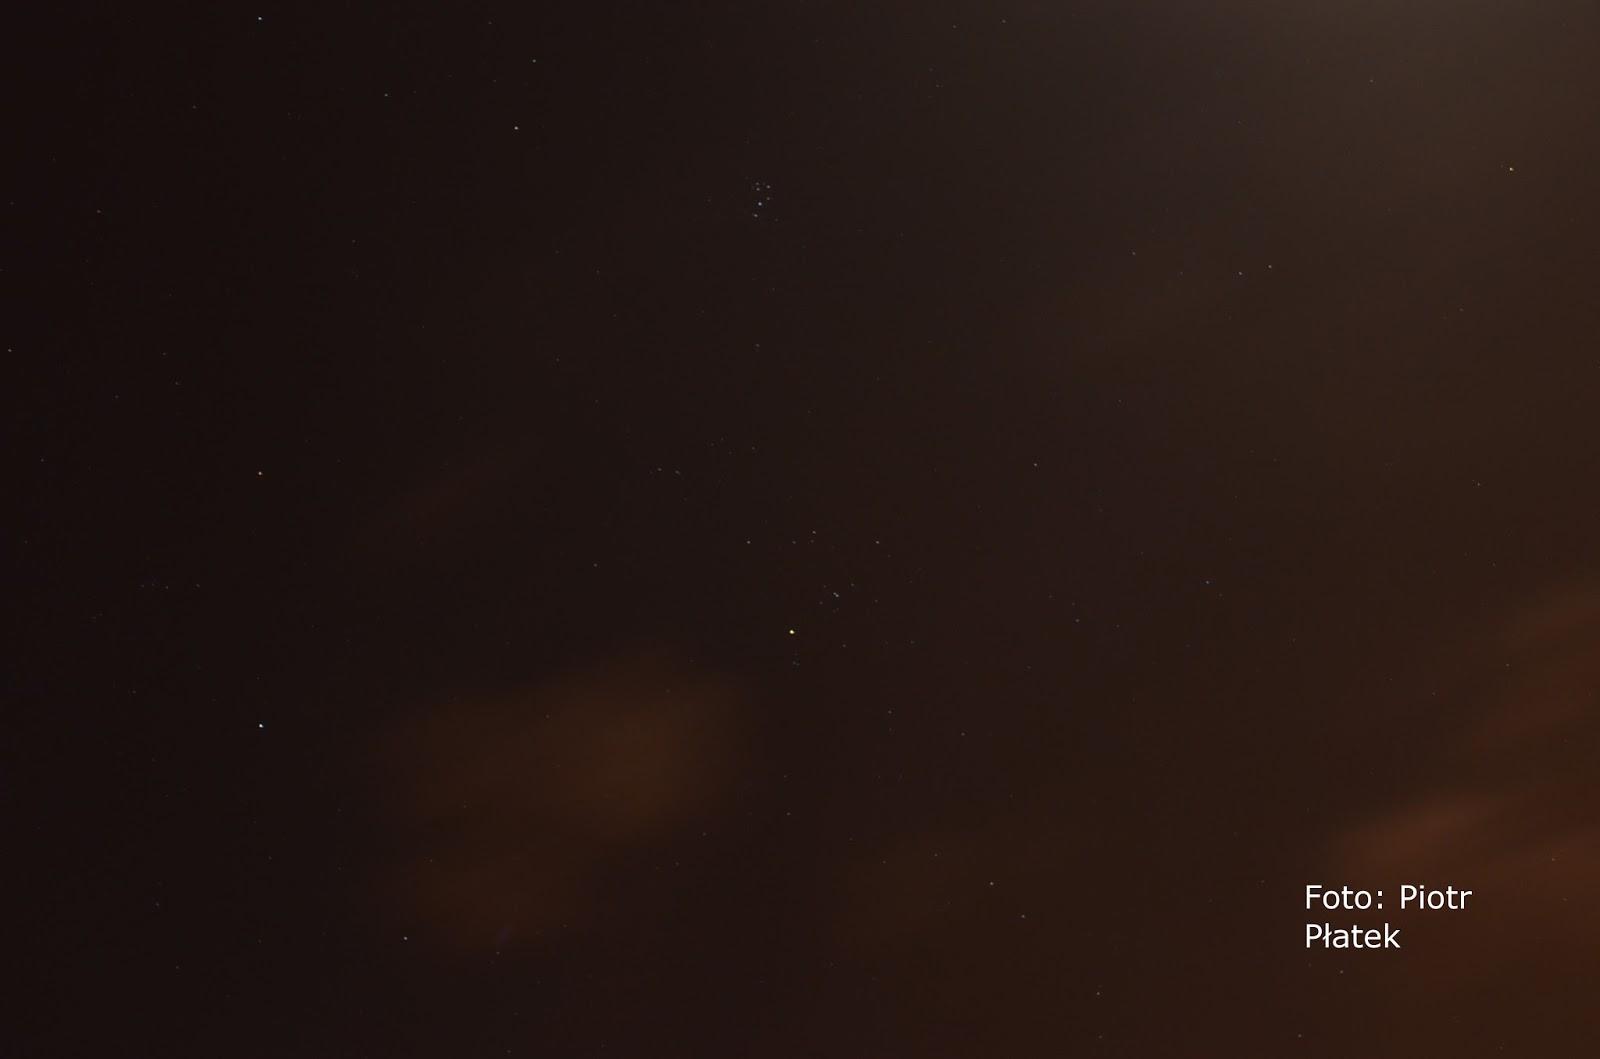 Byk, Taurus, Plejady, Pleiades